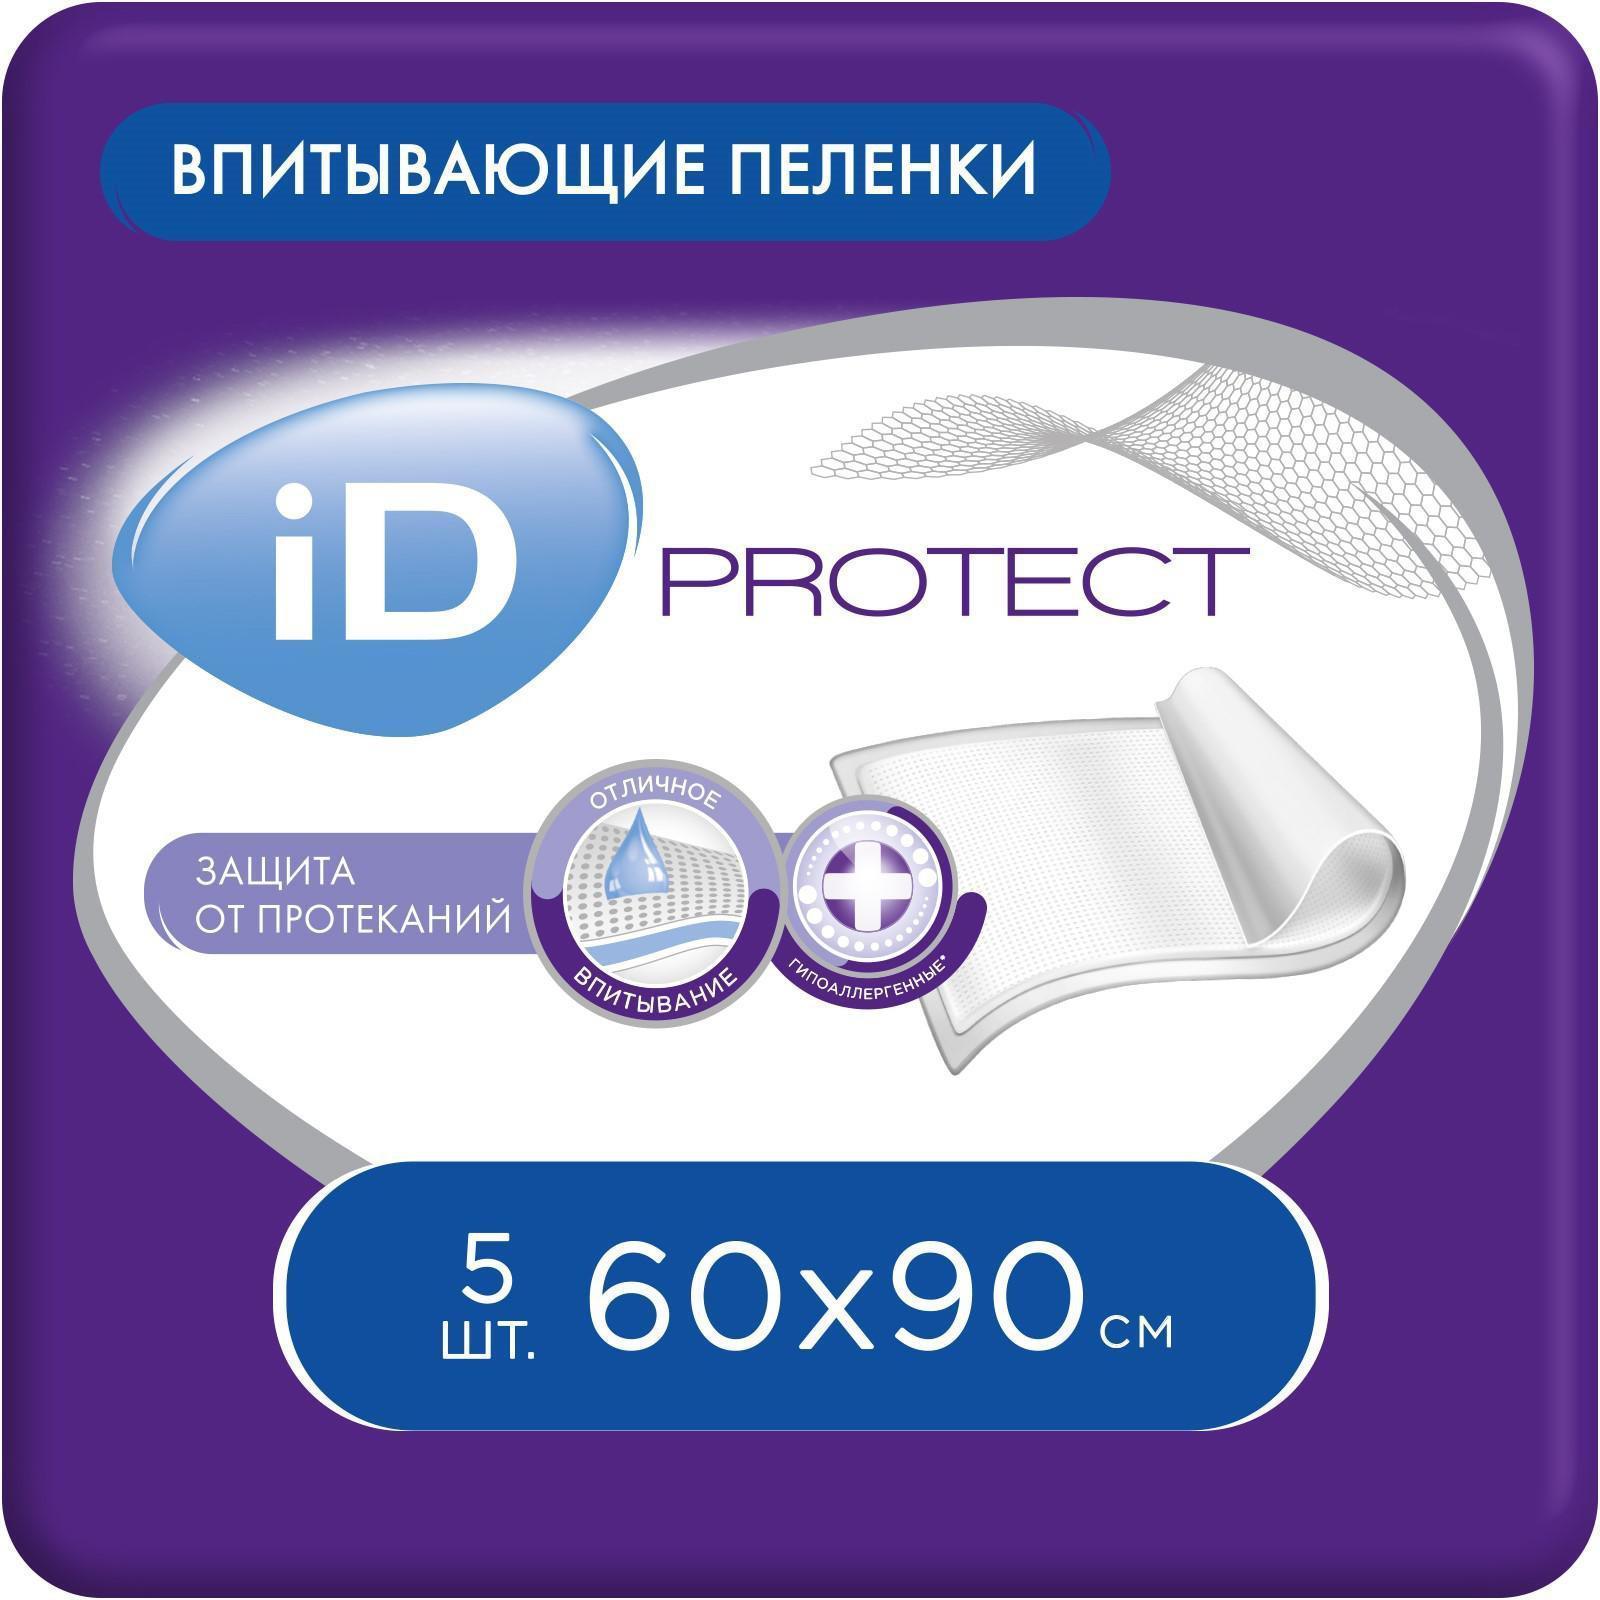 42036f73885c Пеленки одноразовые впитывающие iD Protect 60x90 см 5шт (2326063 ...